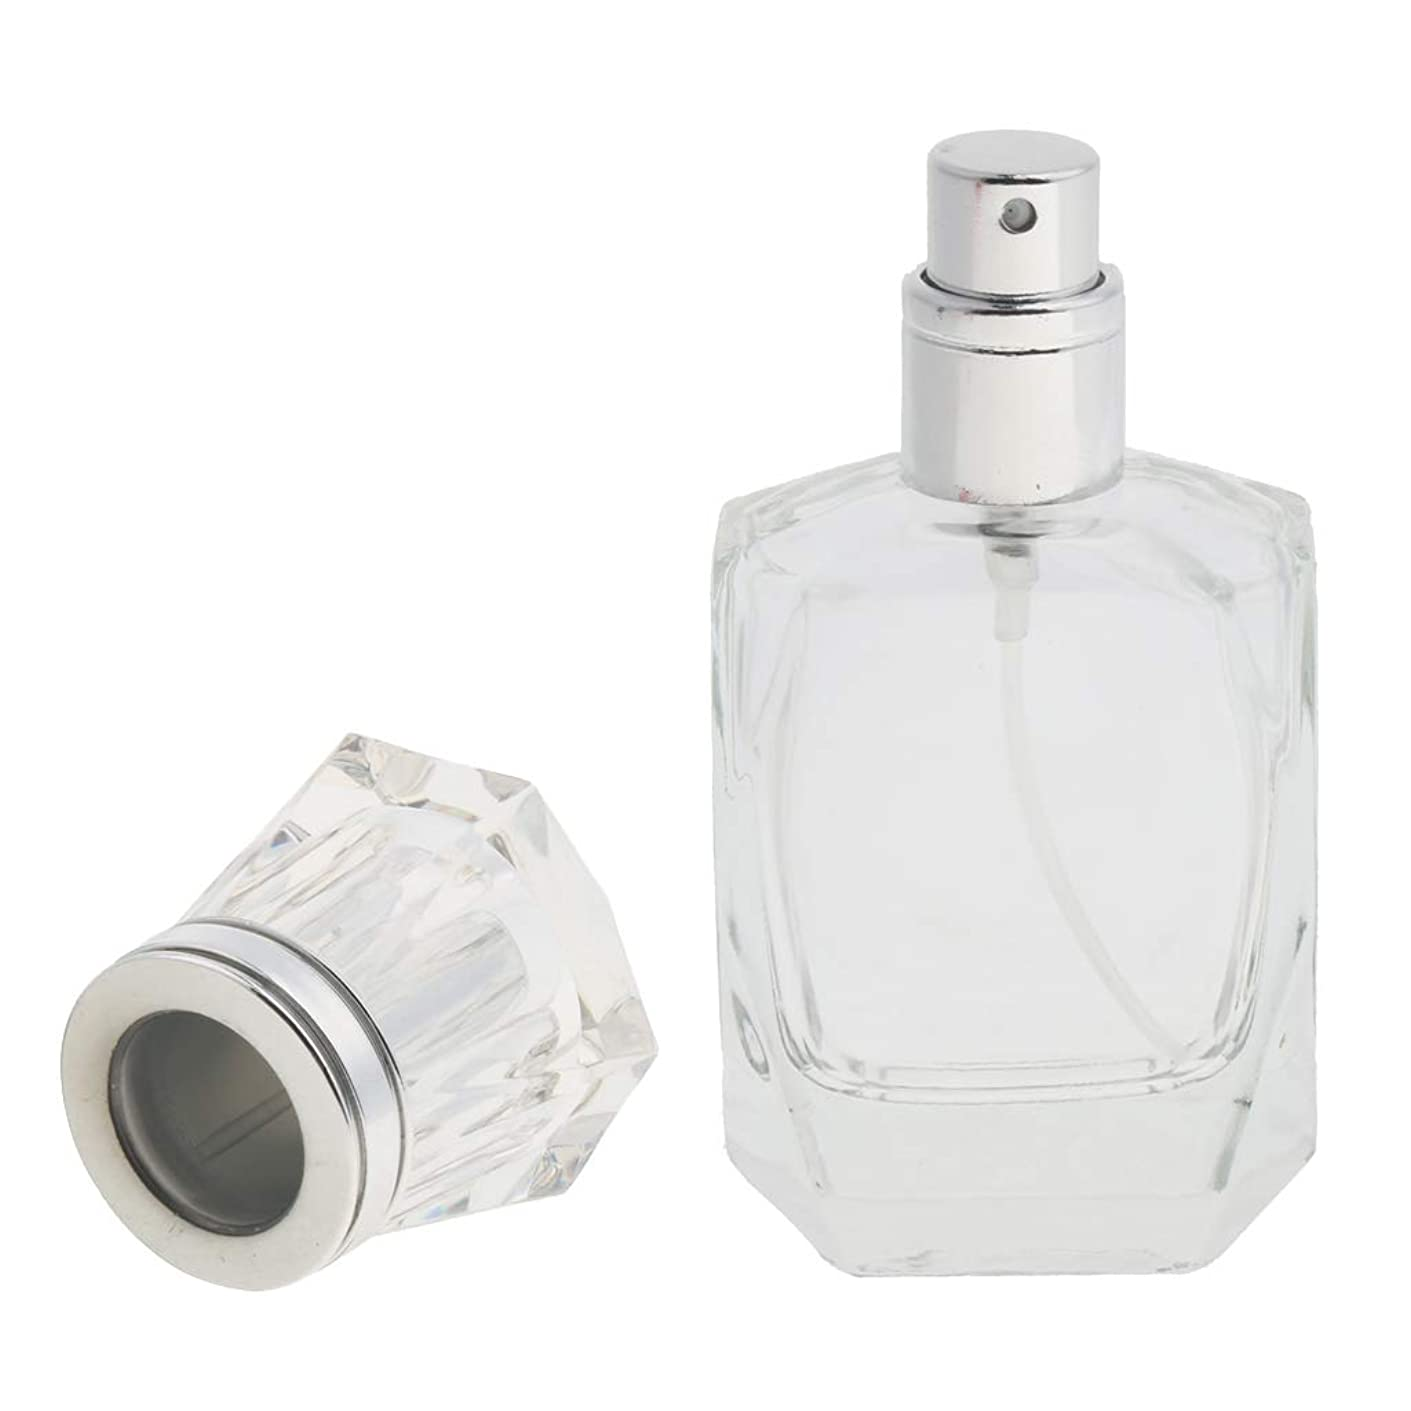 FLAMEER メイクアップボトル 香水ボトル ミストボトル ガラス 詰め替え